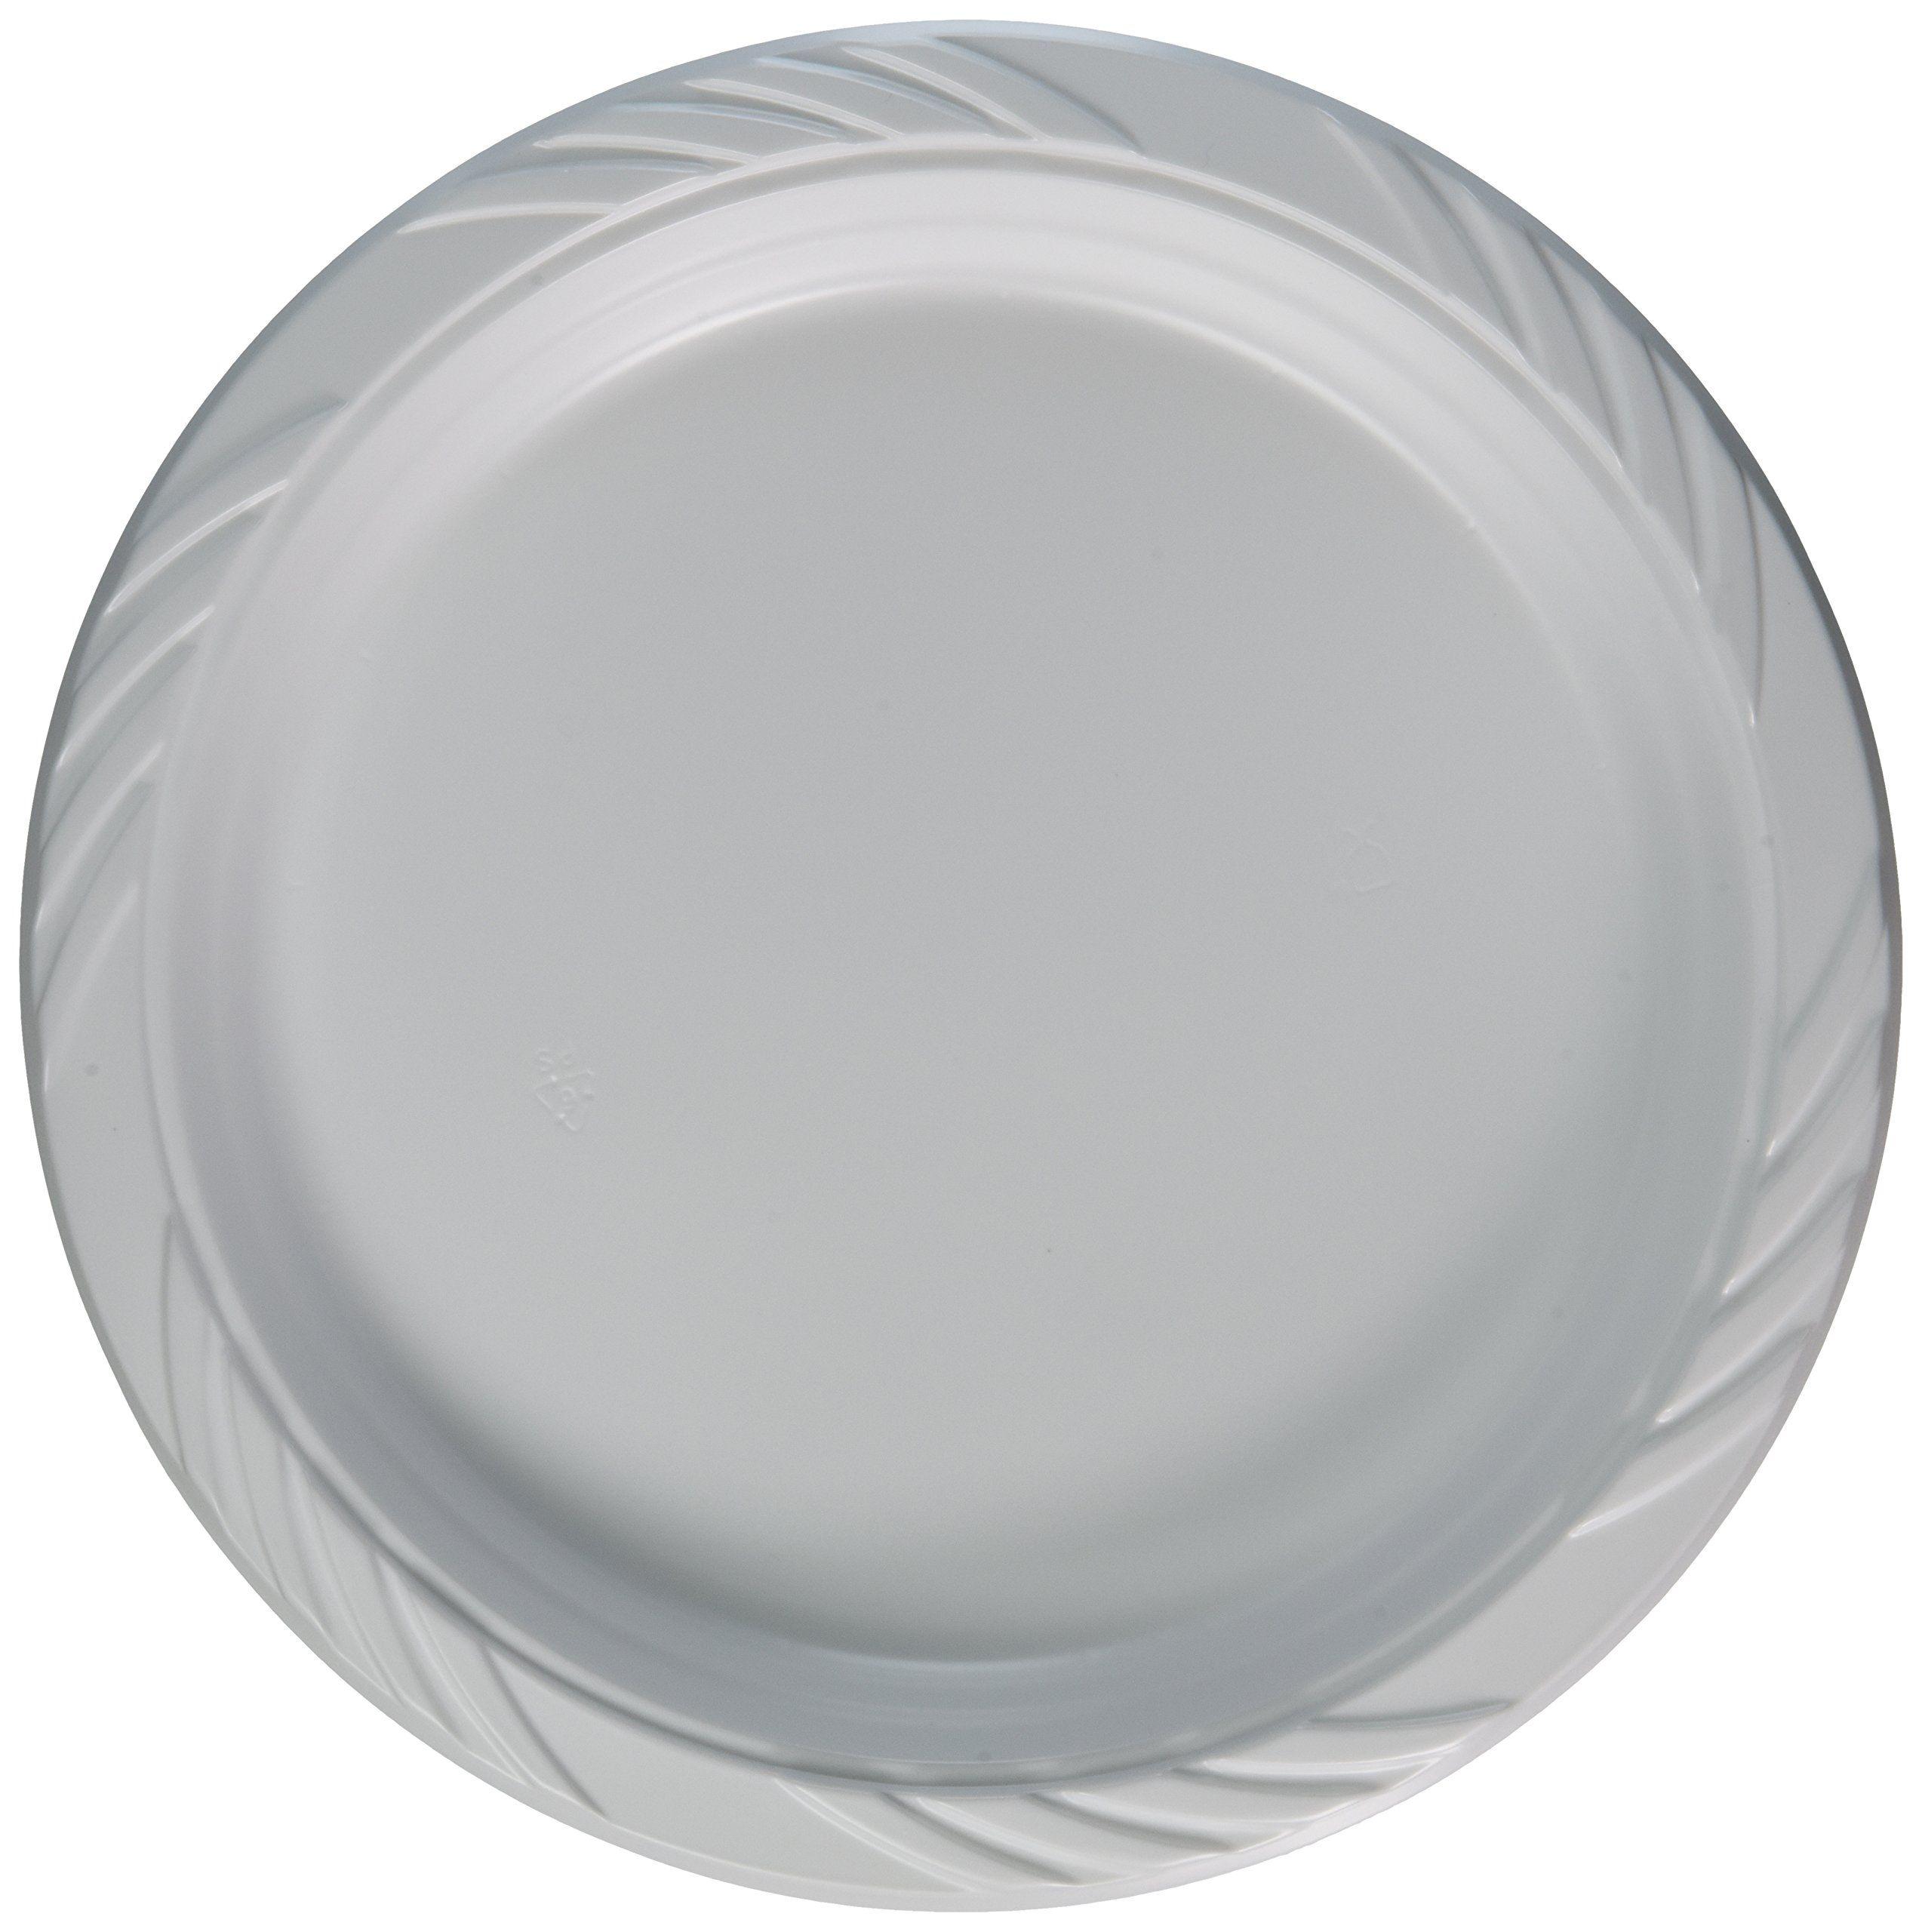 Robot Check Disposable Plastic Plates Plastic Plates White Plastic Plates